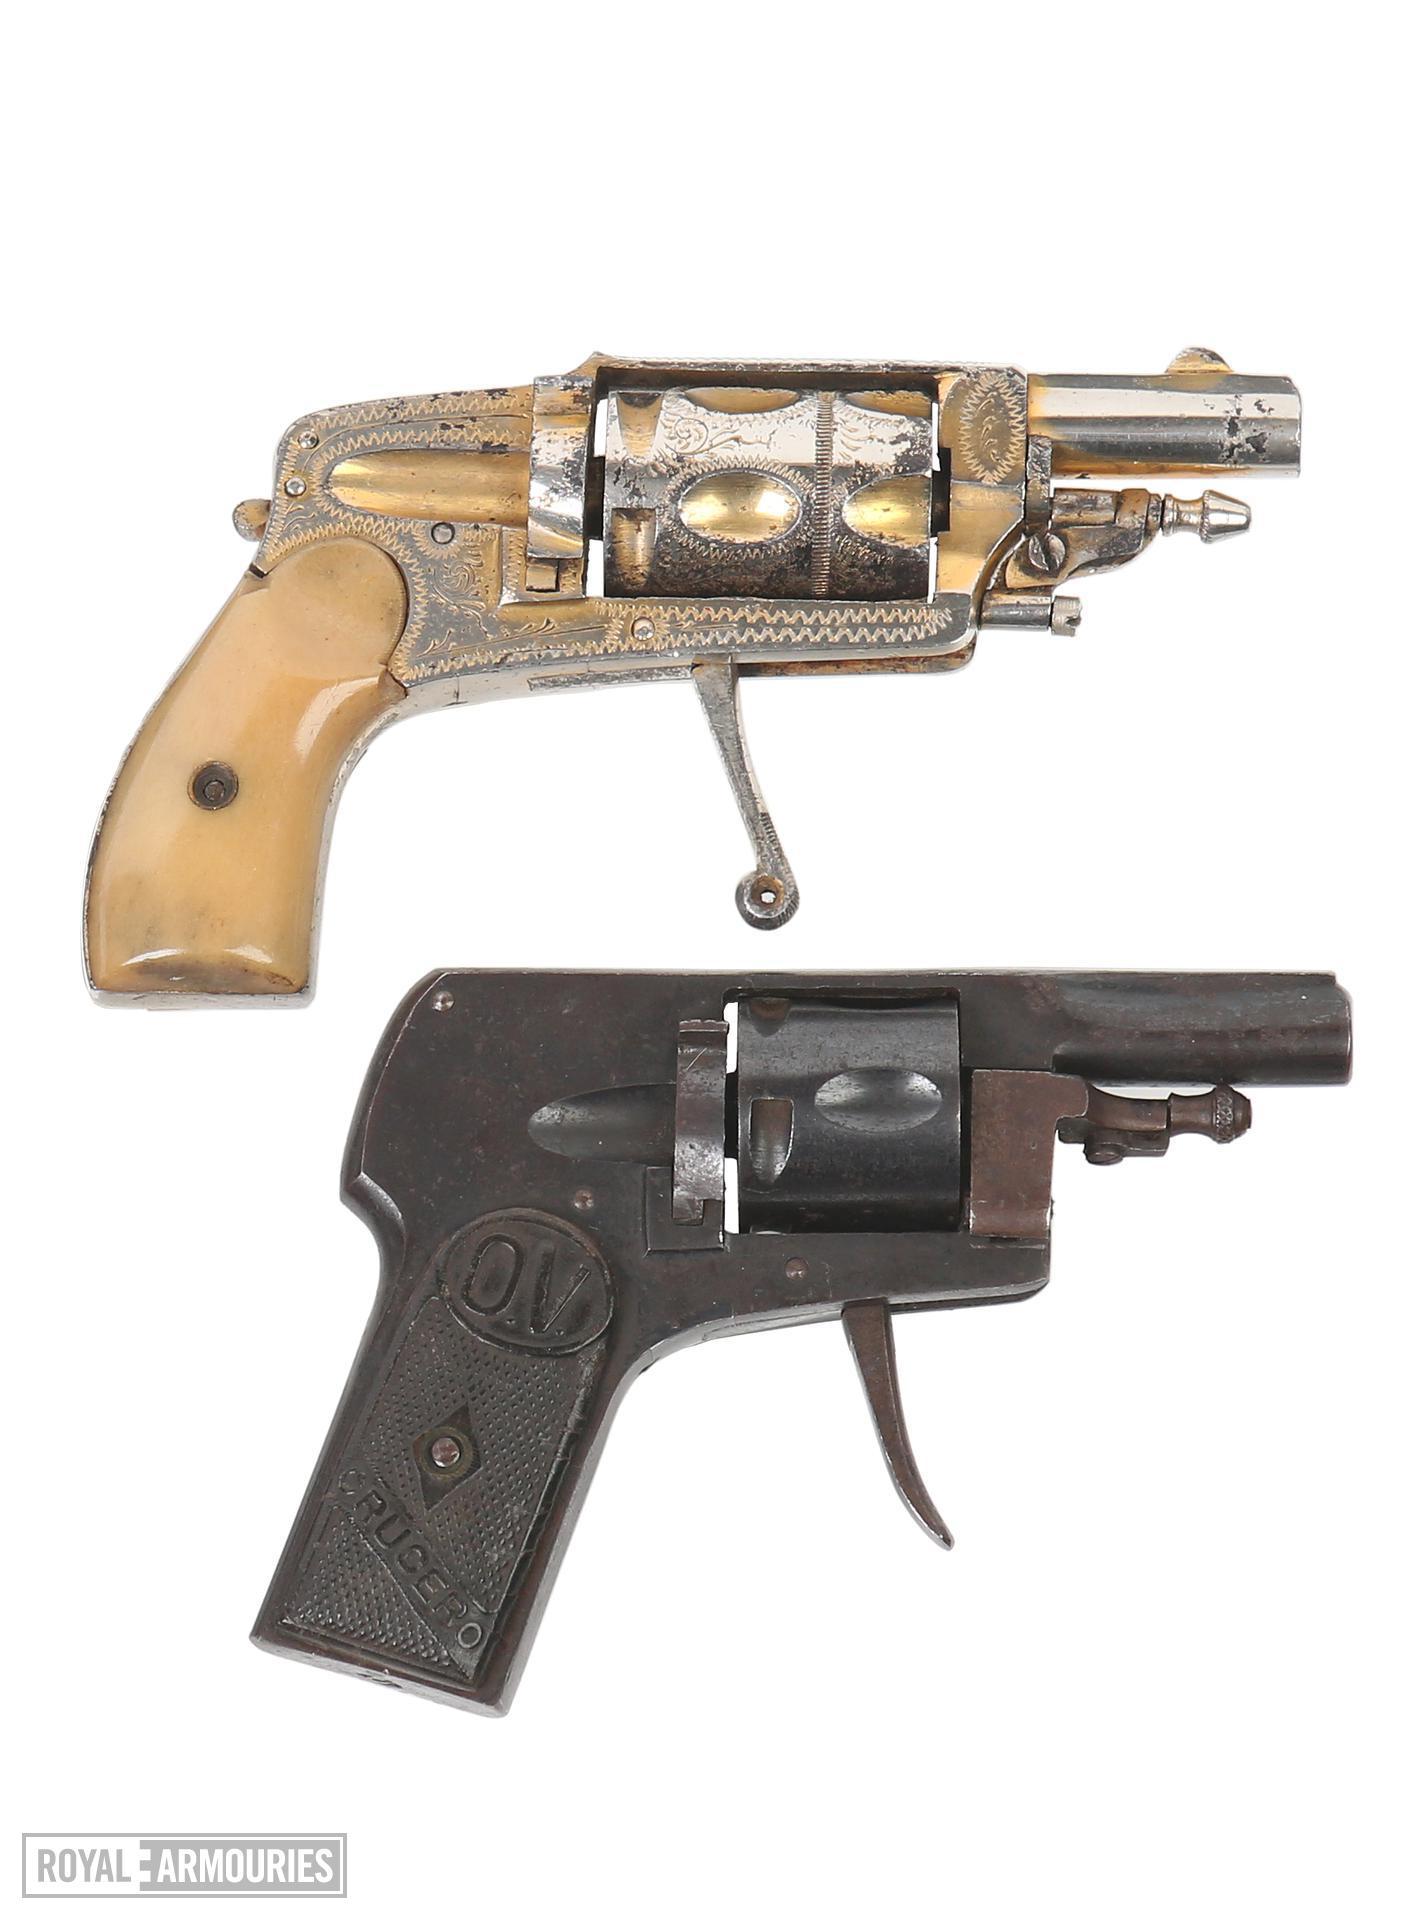 Centrefire five-shot revolver - Velo-dog Crucero